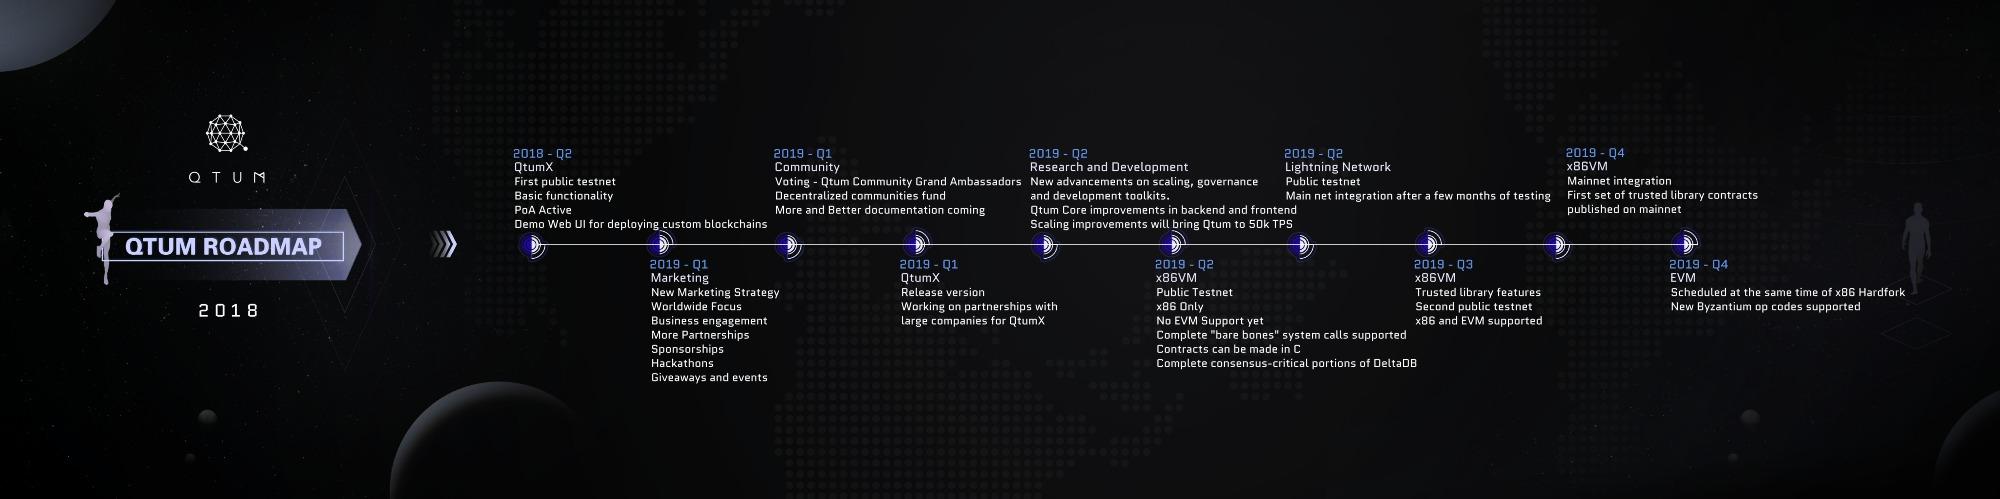 QTUM_roadmap_2018